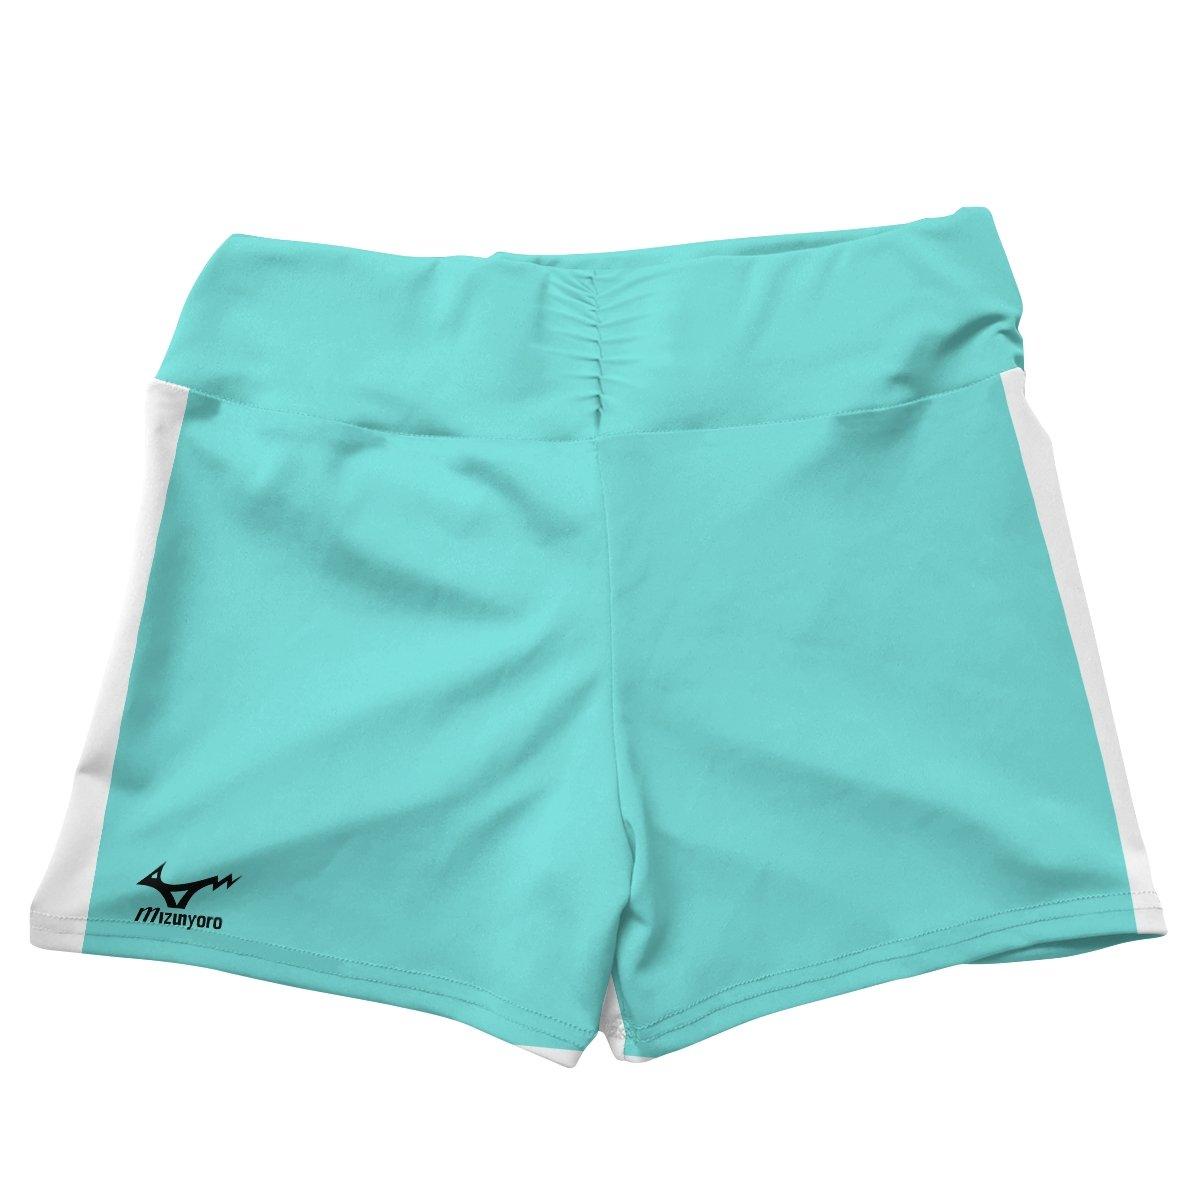 team aoba johsai active wear set 161201 - Anime Swimsuits